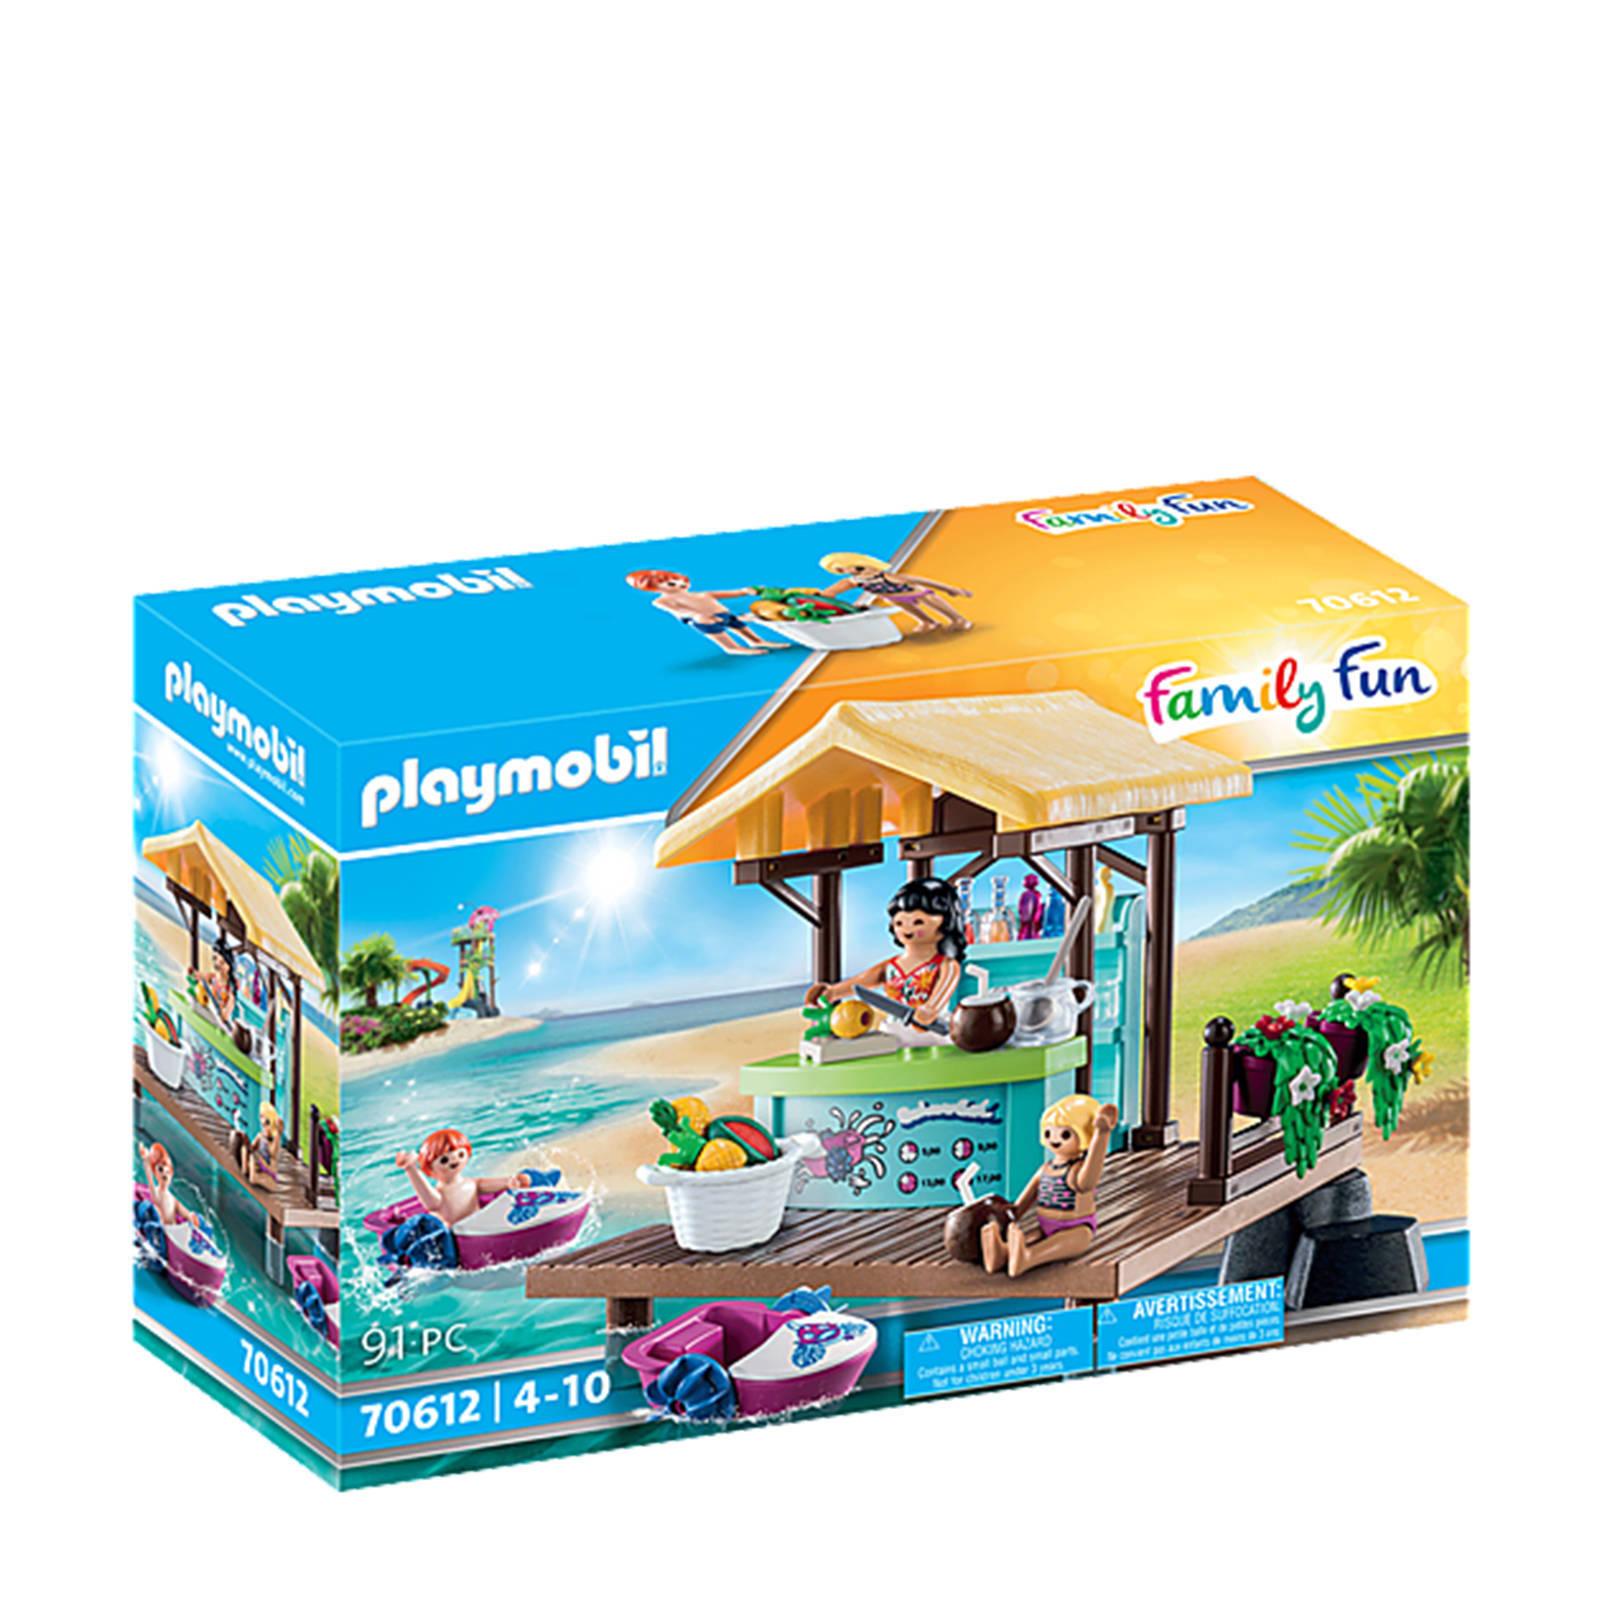 PLAYMOBIL ® Family Fun Paddle Boat verhuur met Juice Bar 70612 online kopen